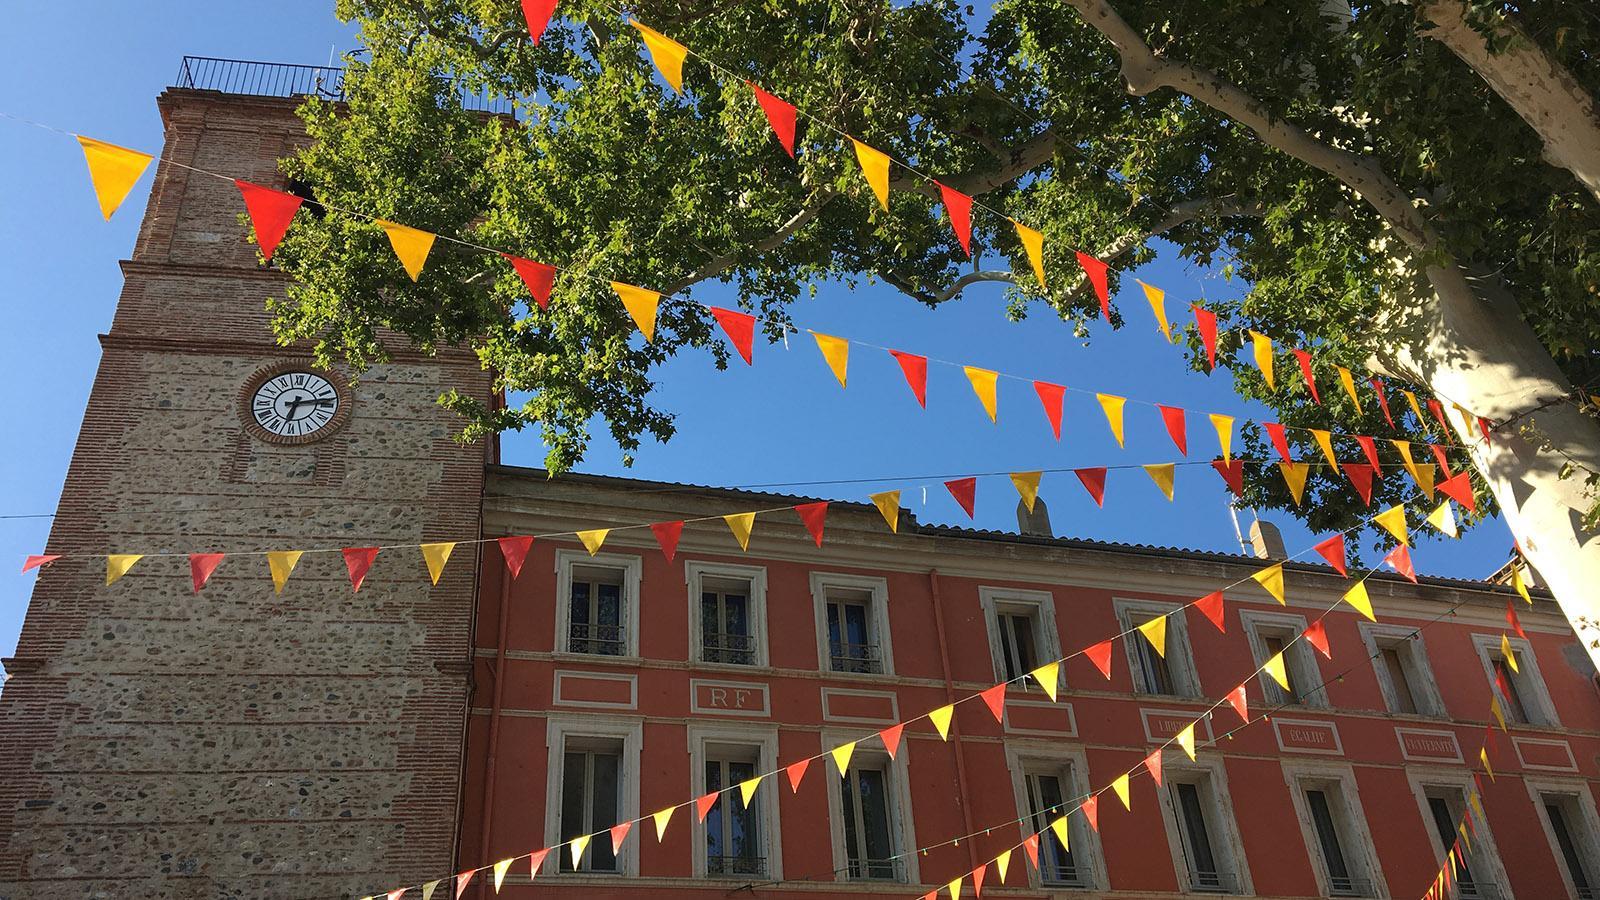 Festlich geschmückt in den Farben des Roussillon: Rivesaltes bei der Fête Babau. Foto: Hilke Maunder